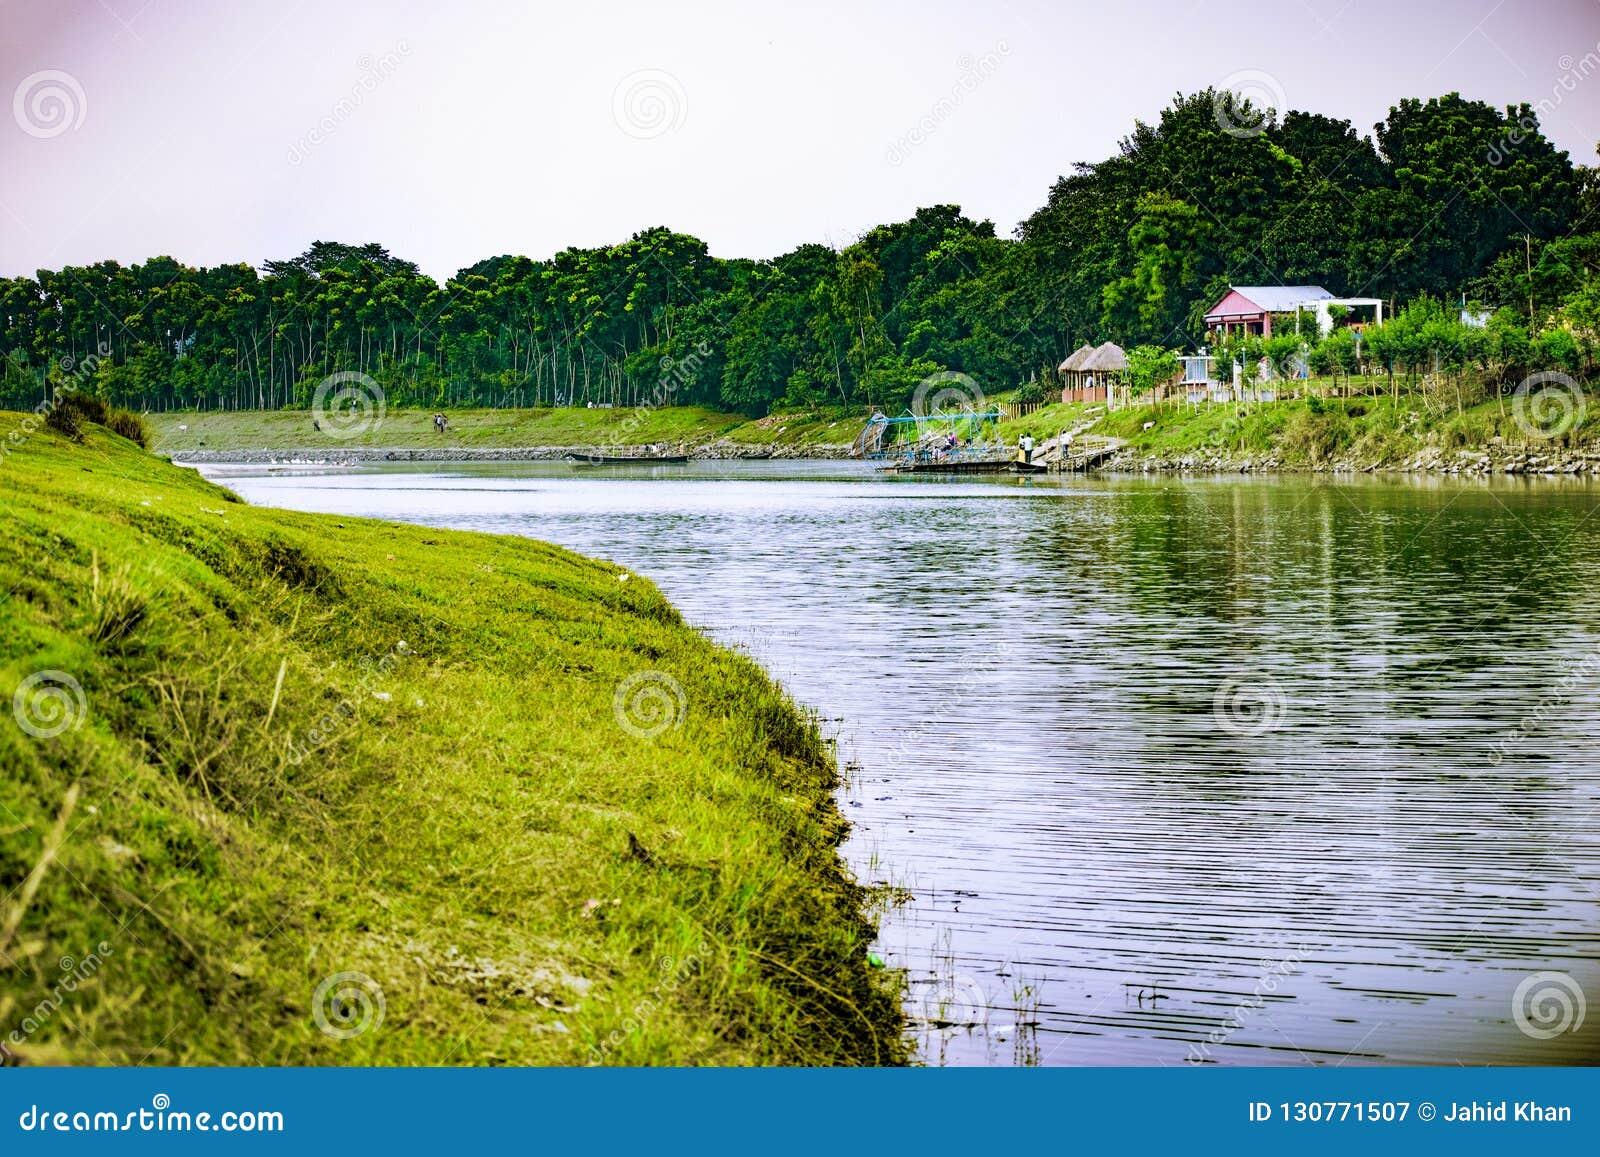 Punorvobarivier, Dinajpur, RÄ  jshÄ  hallo, Bangladesh